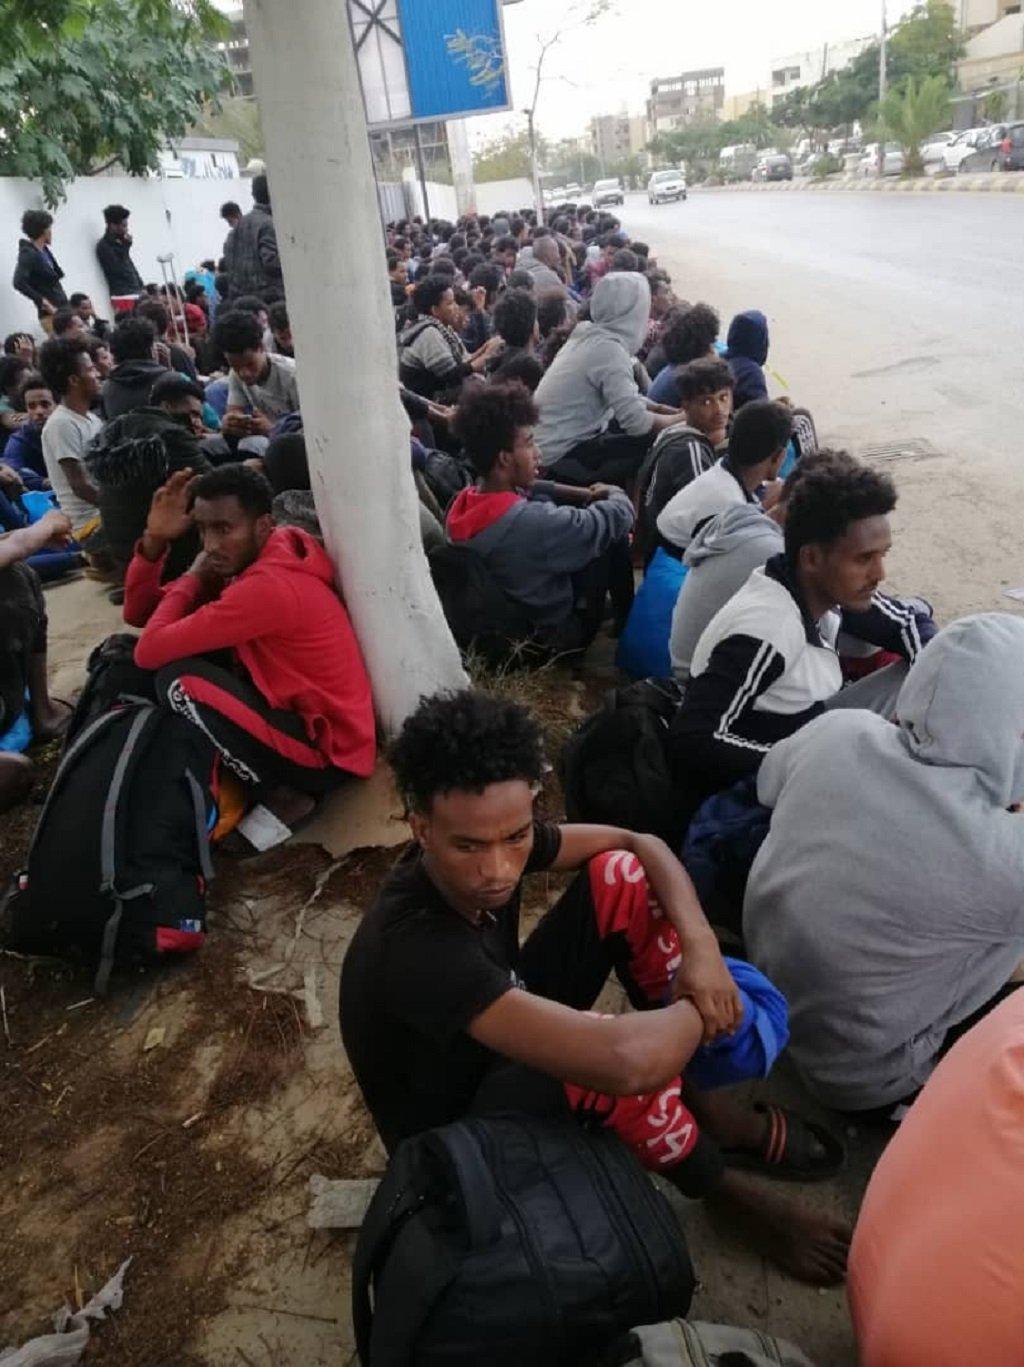 A group of migrants sit outside the UNHCR-run GDF facility in Tripoli   Photo: Abu Salim migrants